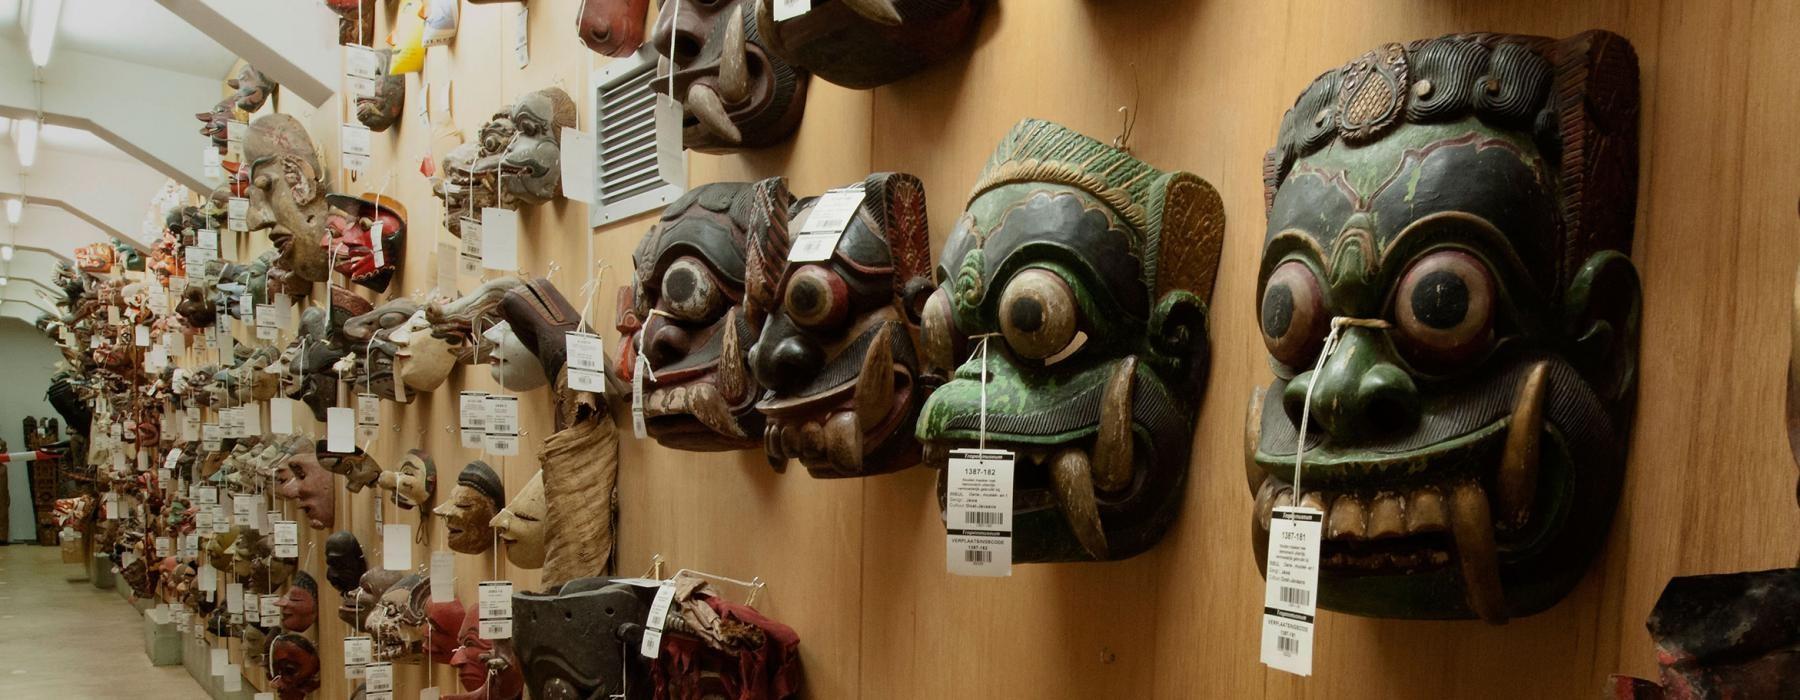 historic masks hanging at Wereldmuseum